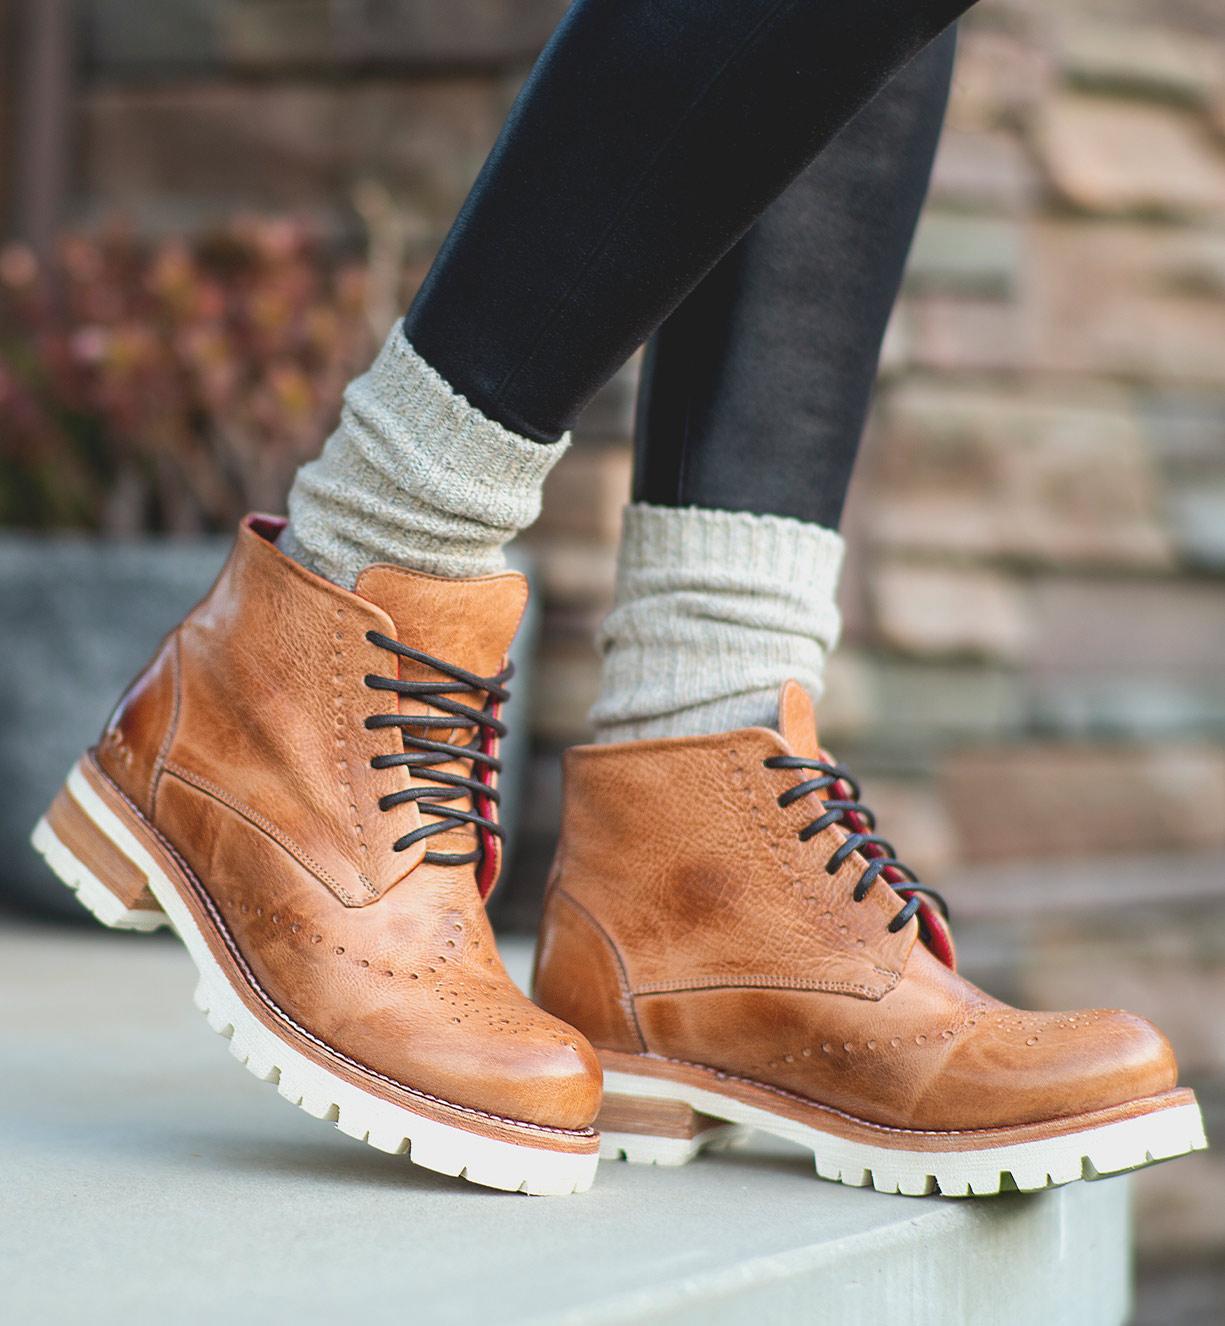 lace up short boots on lightweight platform